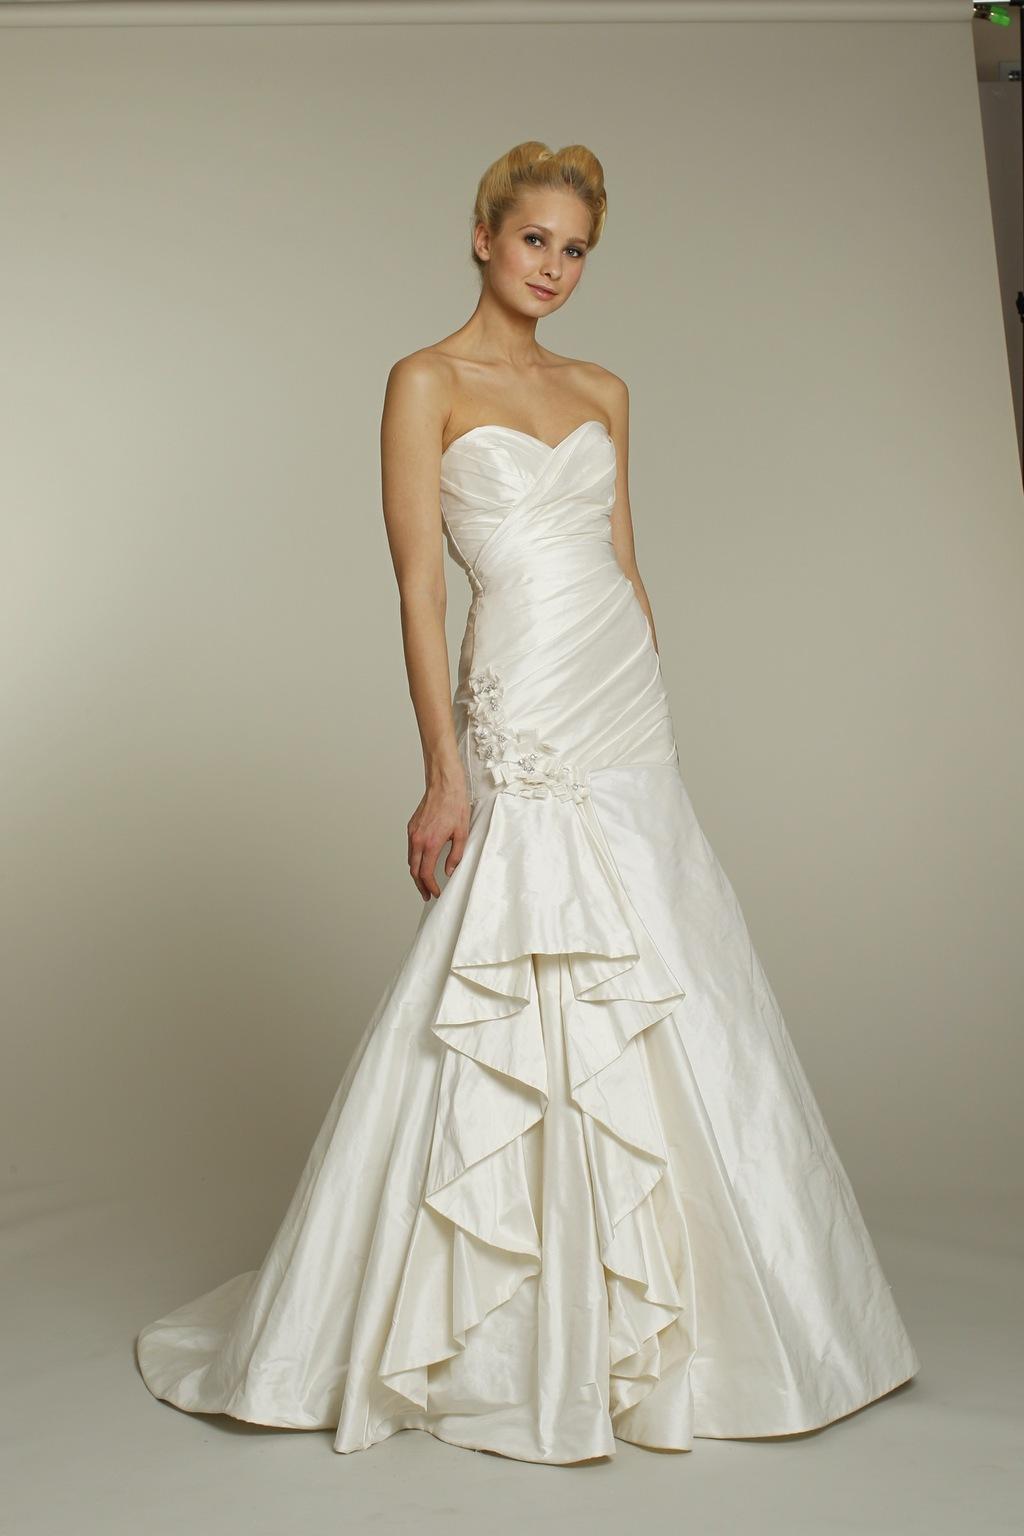 sweetheart neckline a-line Alvina Valenta wedding dress